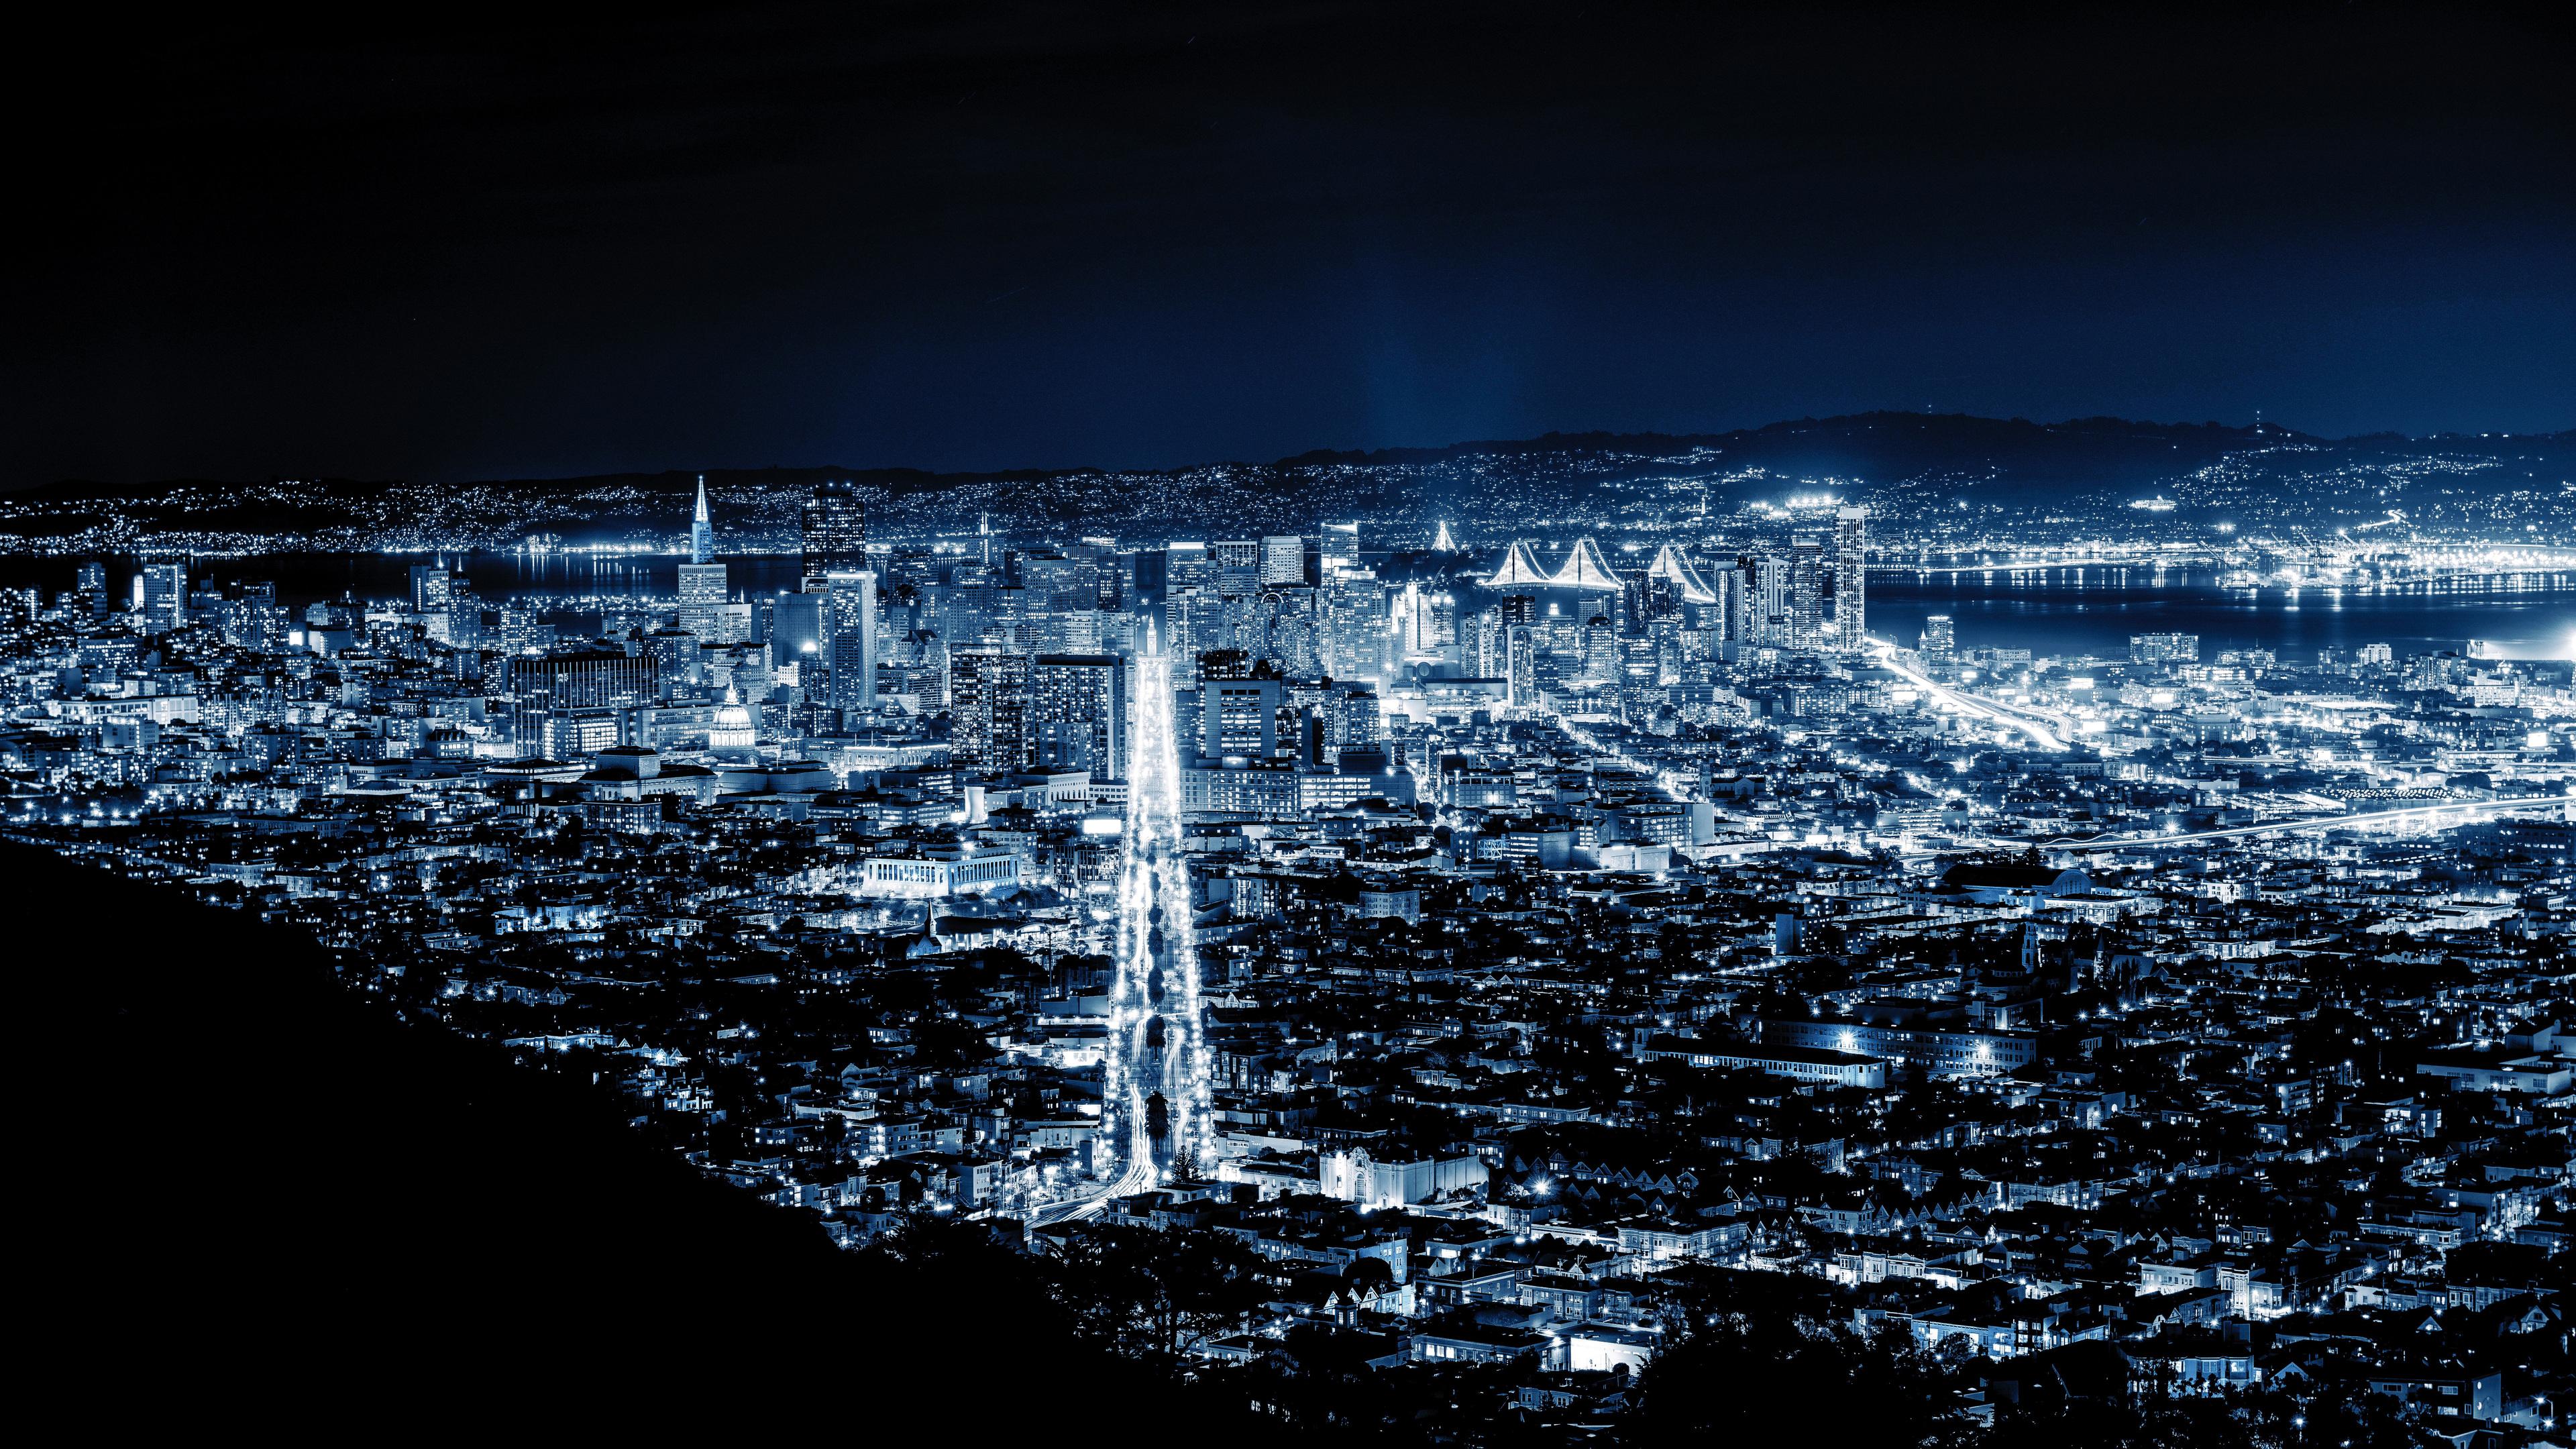 san francisco night 8k 1538072086 - San Francisco Night 8k - world wallpapers, san franciso wallpapers, night wallpapers, hd-wallpapers, city wallpapers, 8k wallpapers, 5k wallpapers, 4k-wallpapers